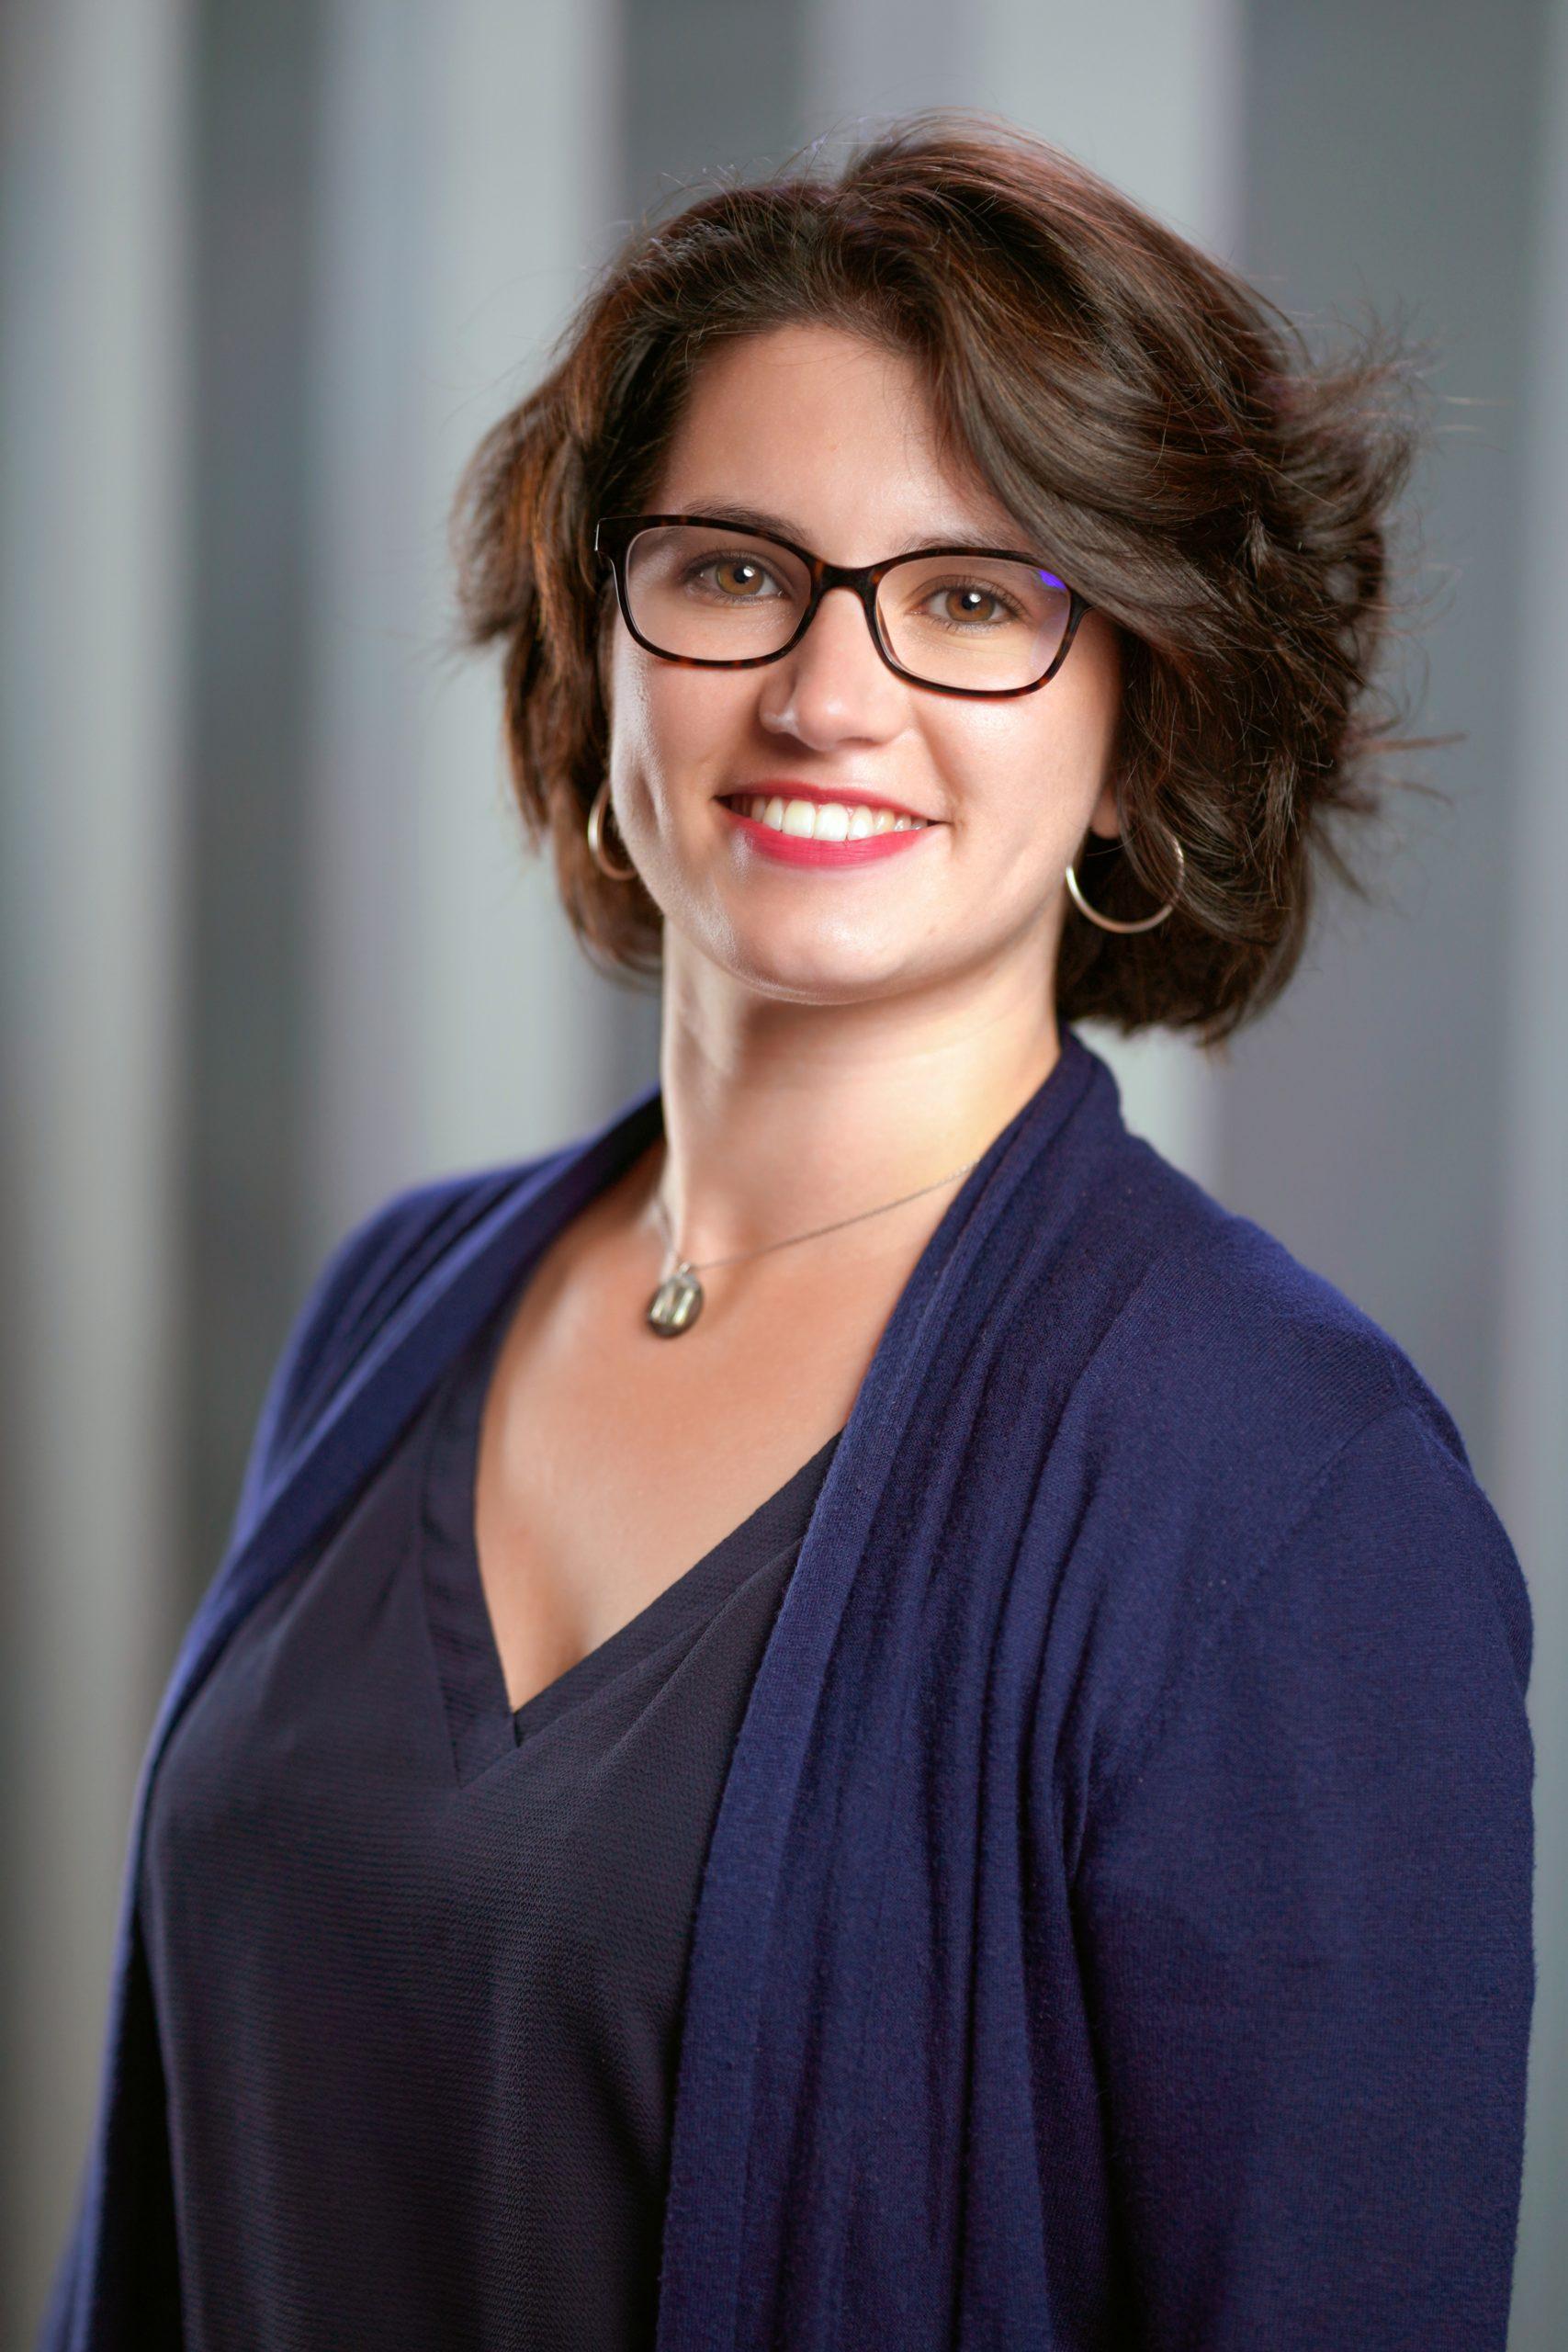 Cindy Prieto